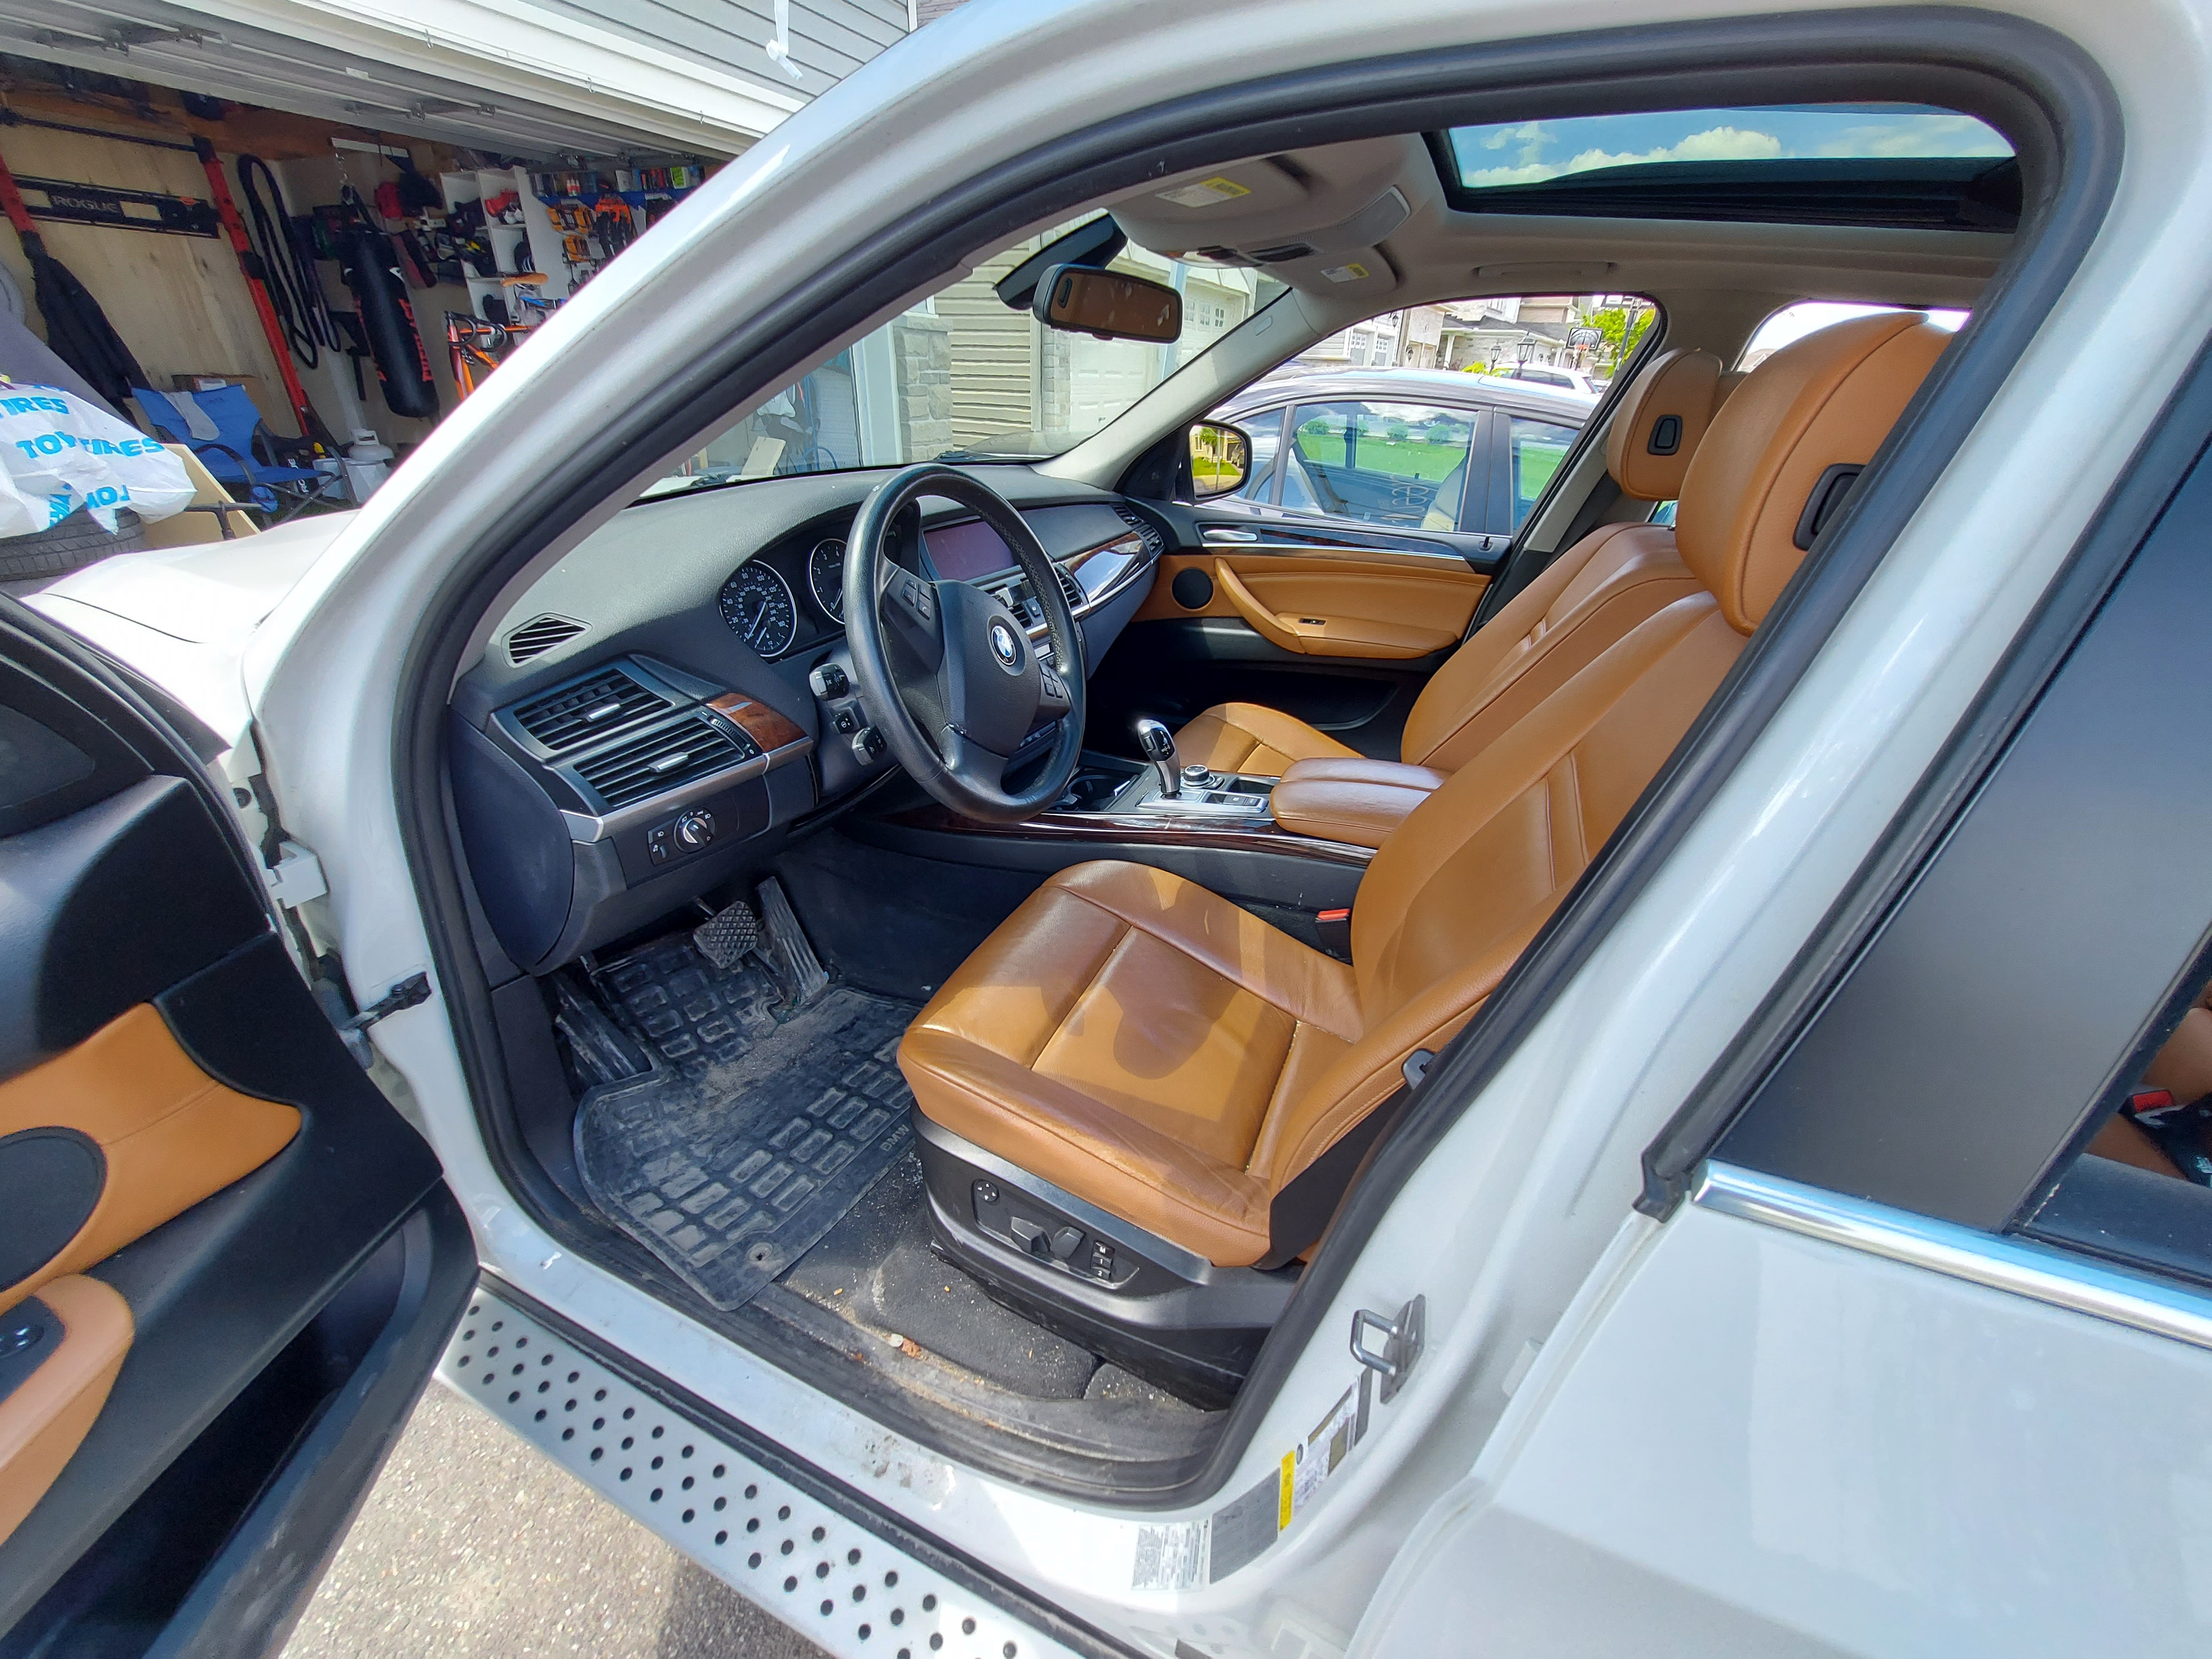 Nepean car detailing review